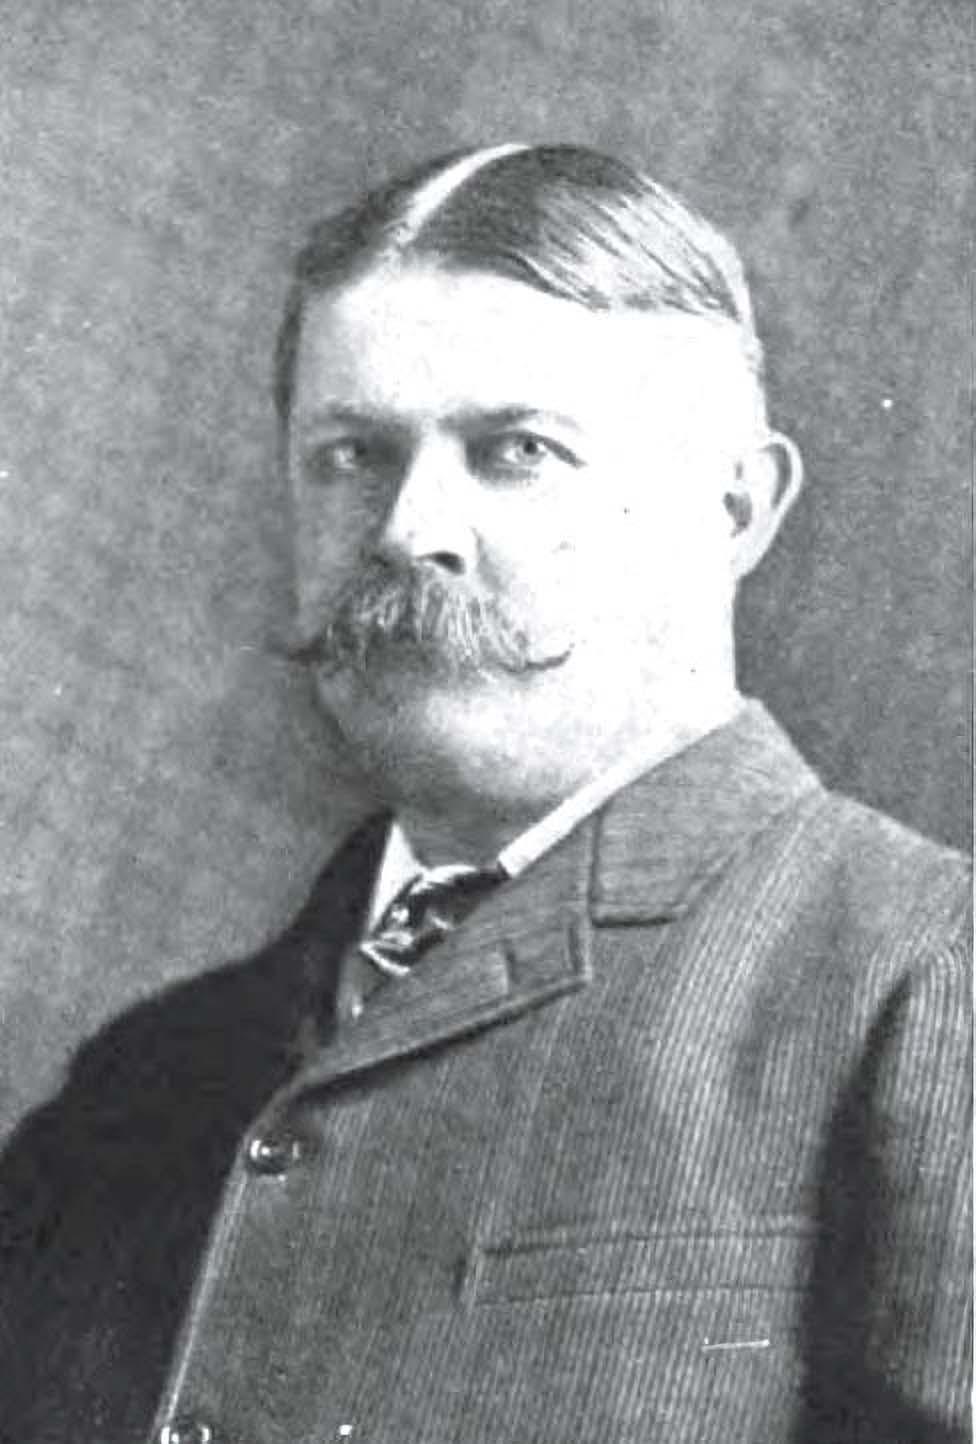 LHT Johnson Trolley Line Albert Munsey